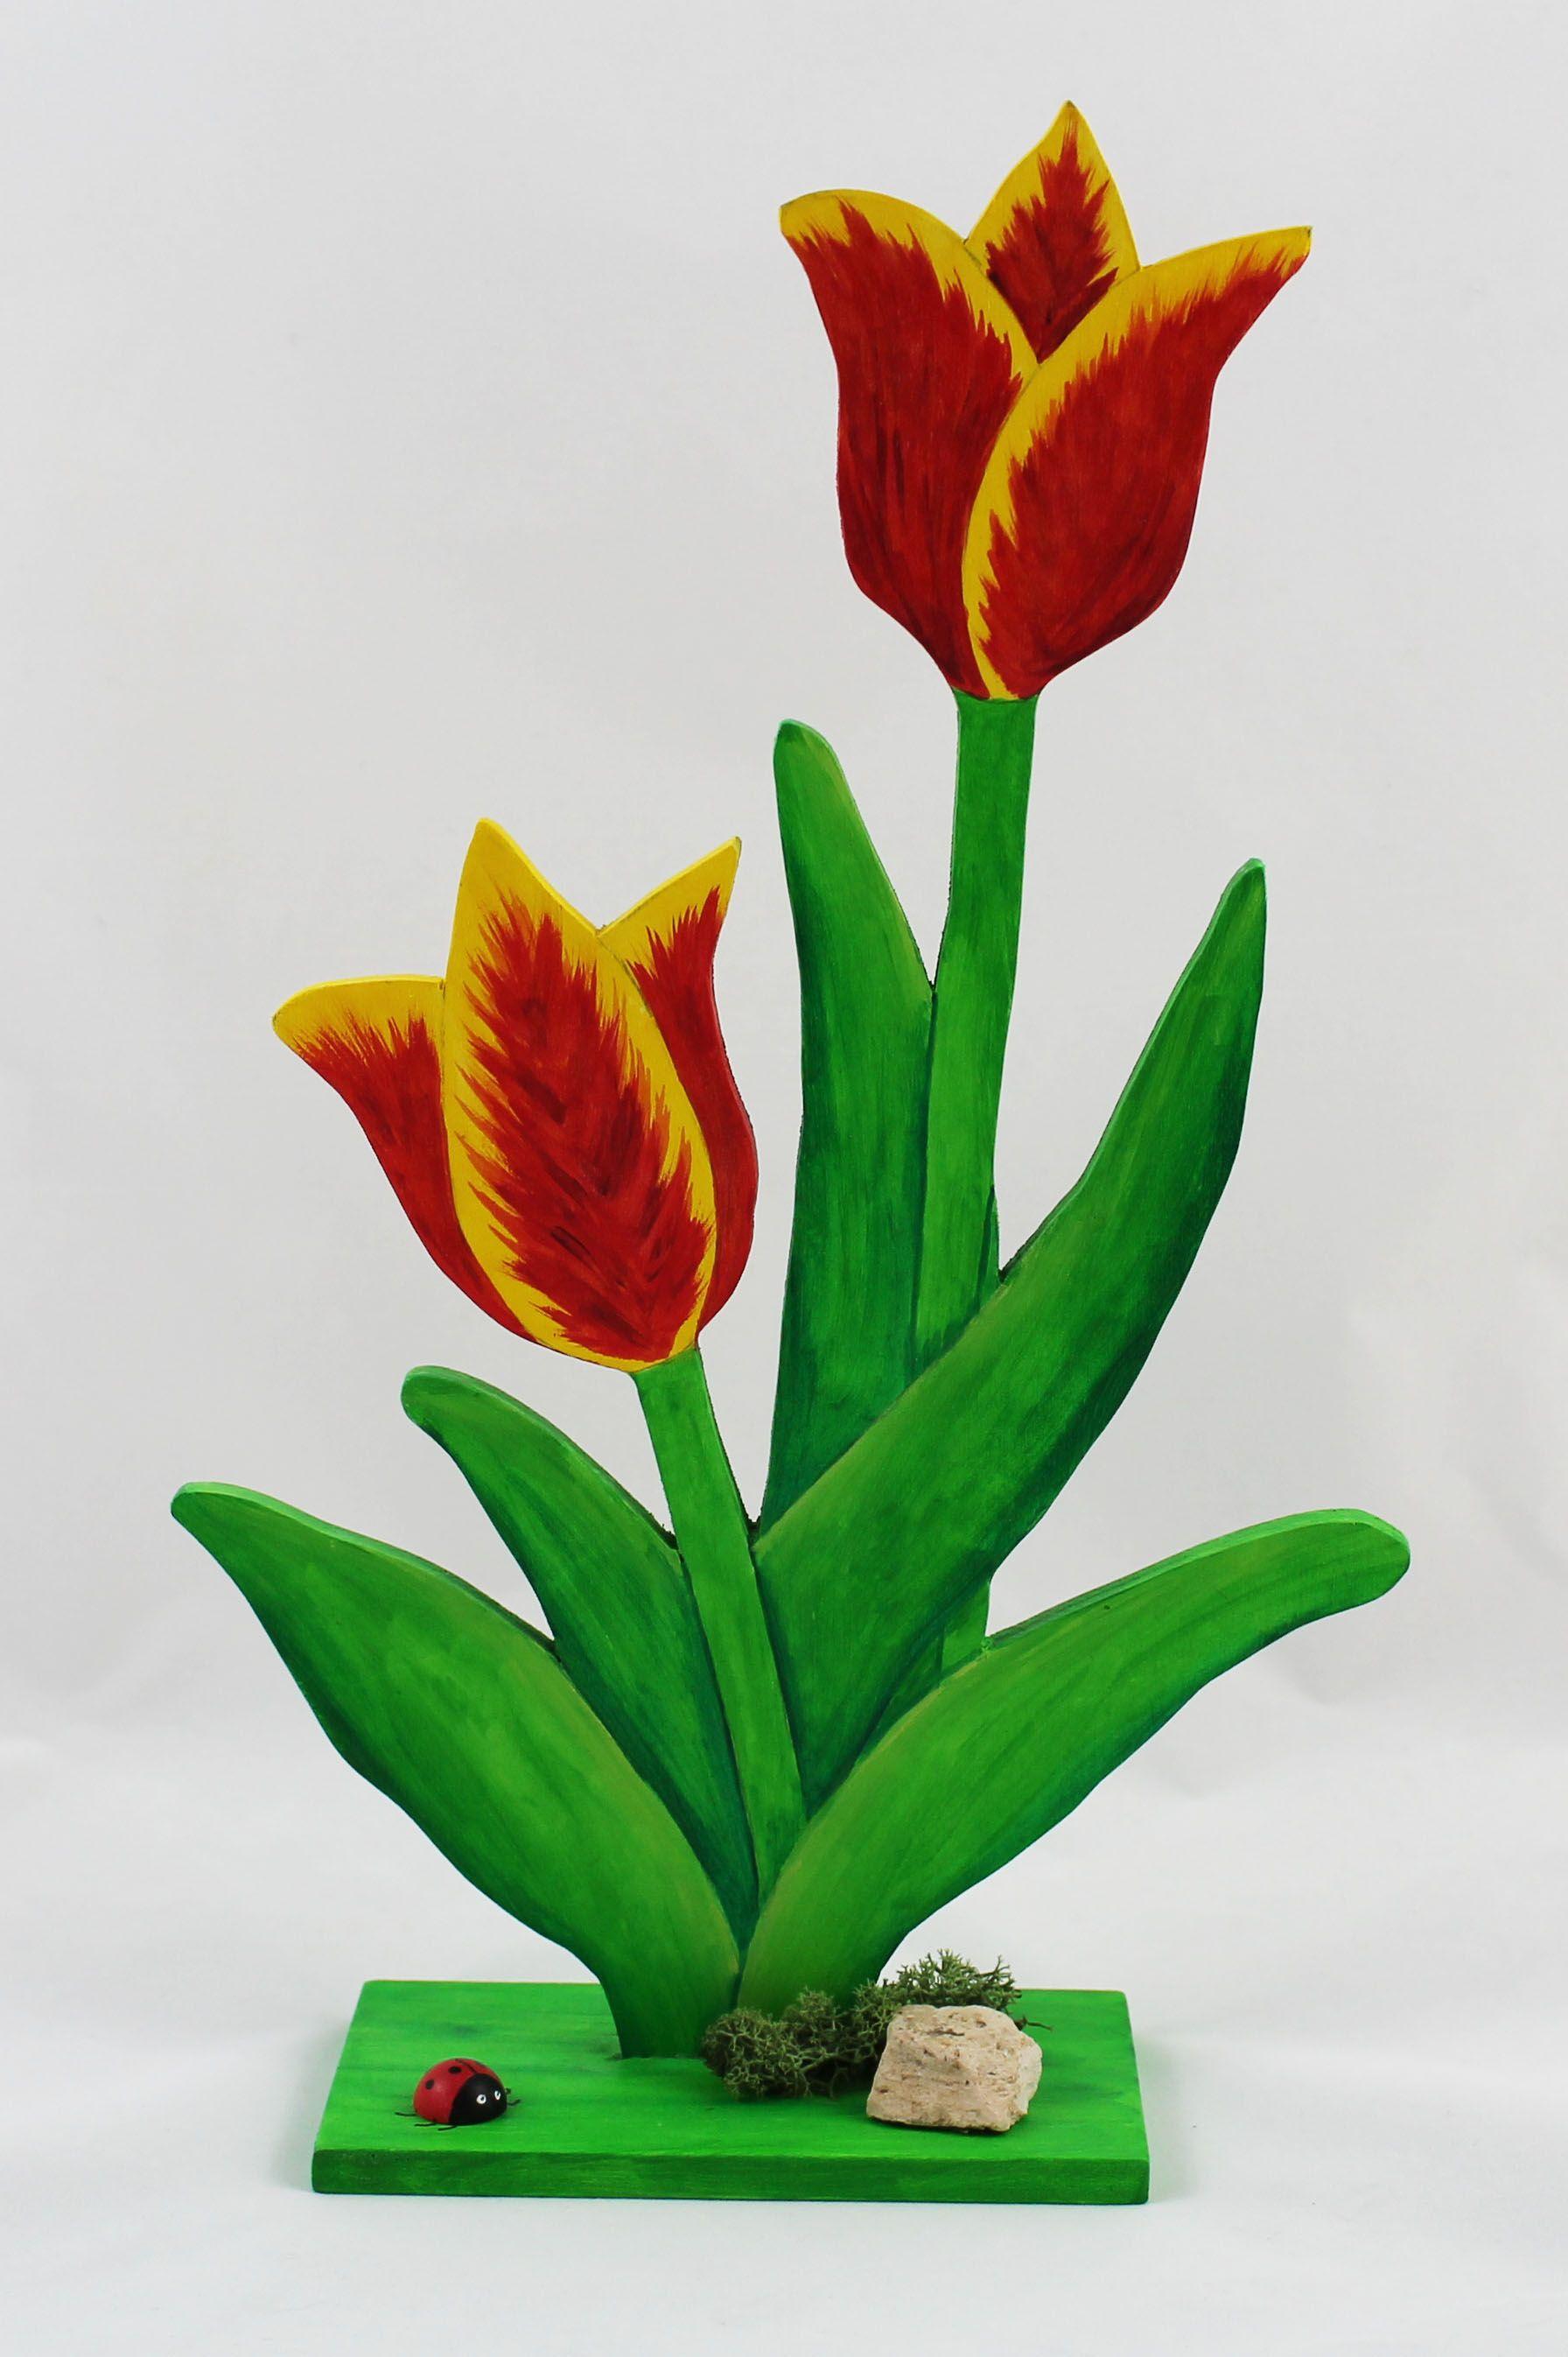 gro e tulpe in versch varianten holzdeko ostern pinterest holz tulpen und holzdeko. Black Bedroom Furniture Sets. Home Design Ideas